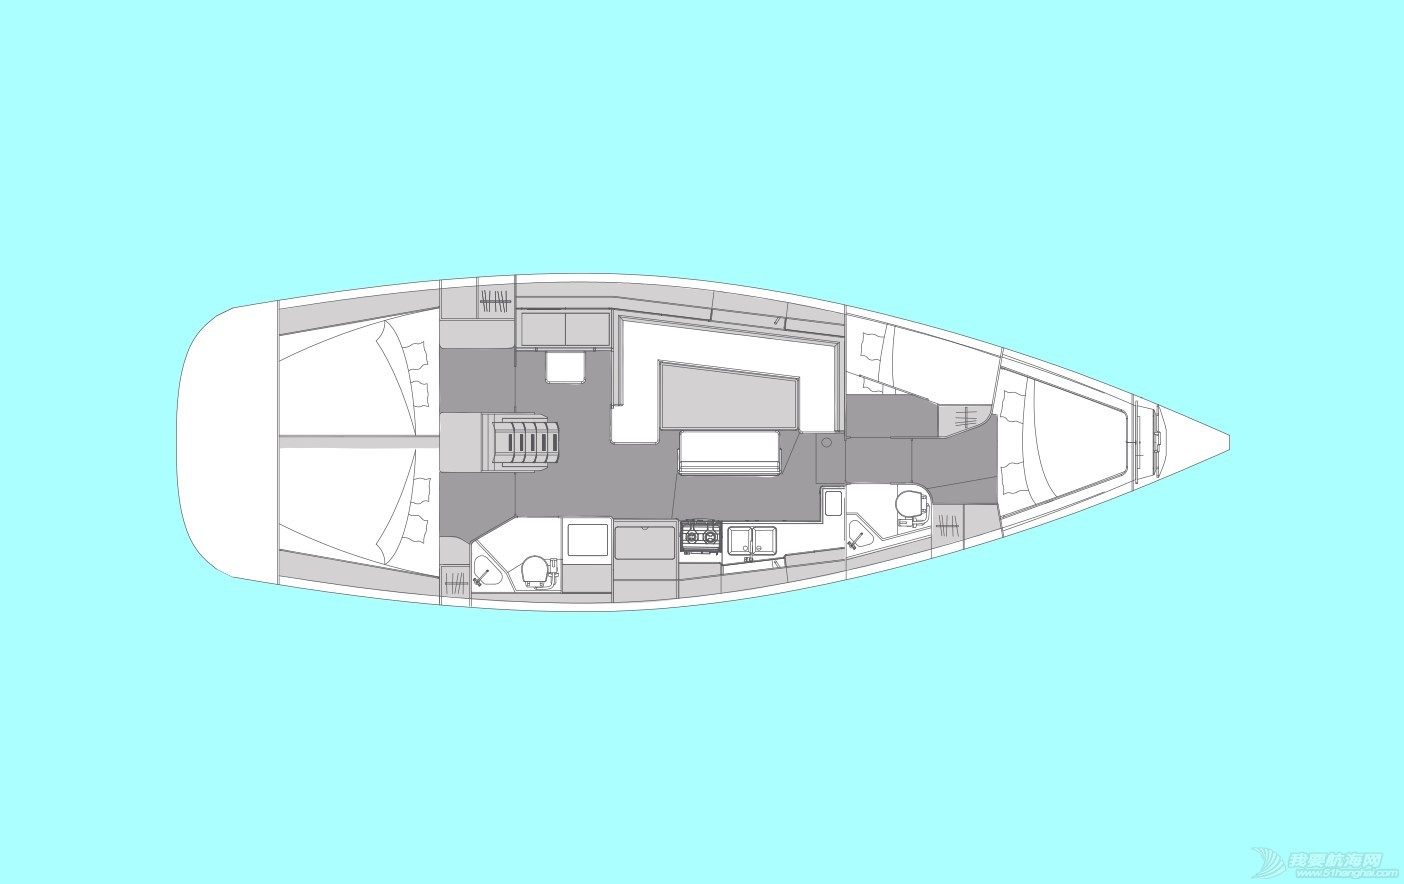 layout-i45-1-b_1.jpg